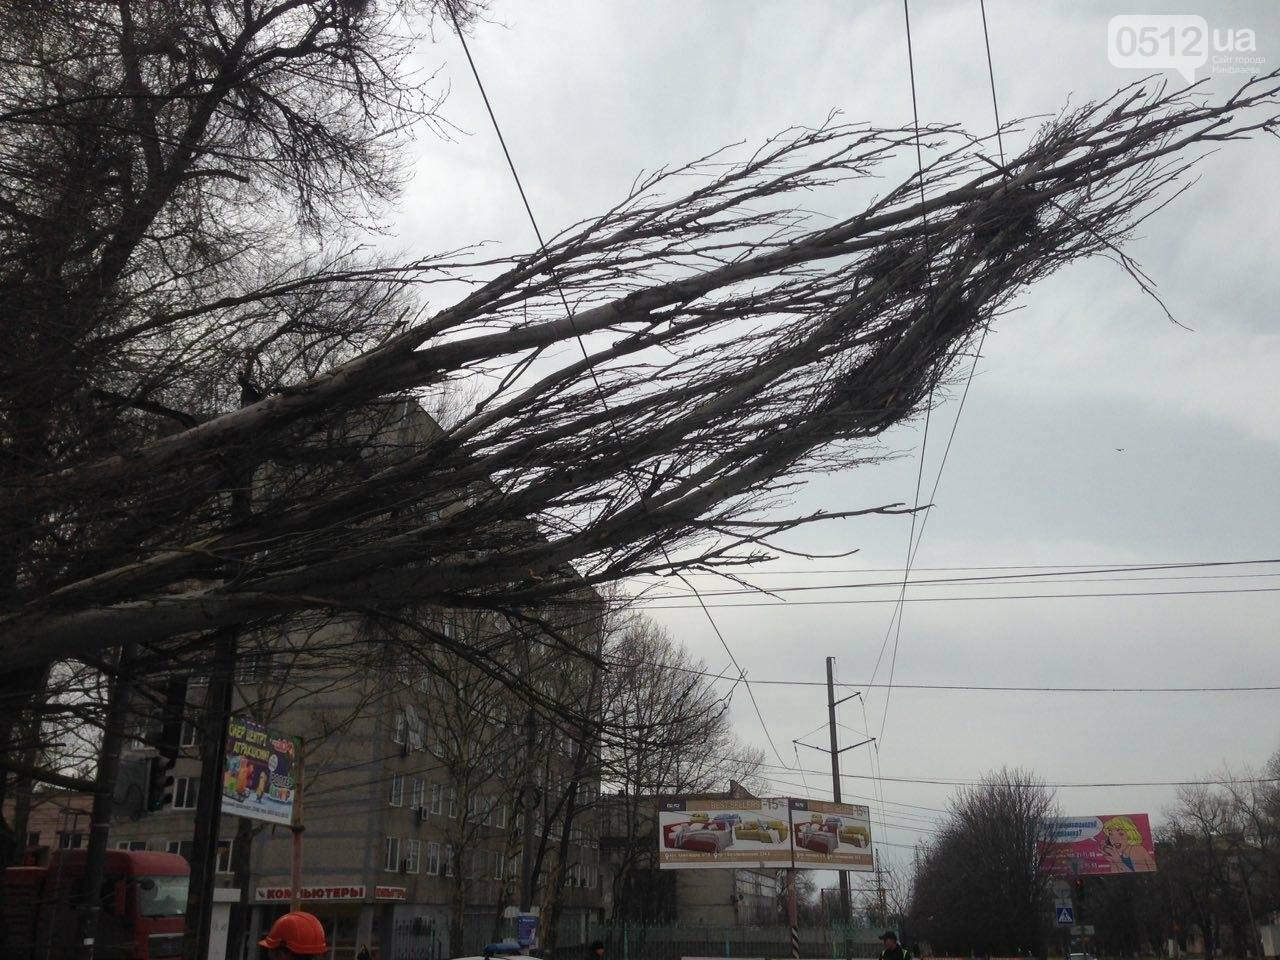 В Николаеве из-за сильного ветра дерево упало на дорогу и задело провода, - ФОТО, фото-4